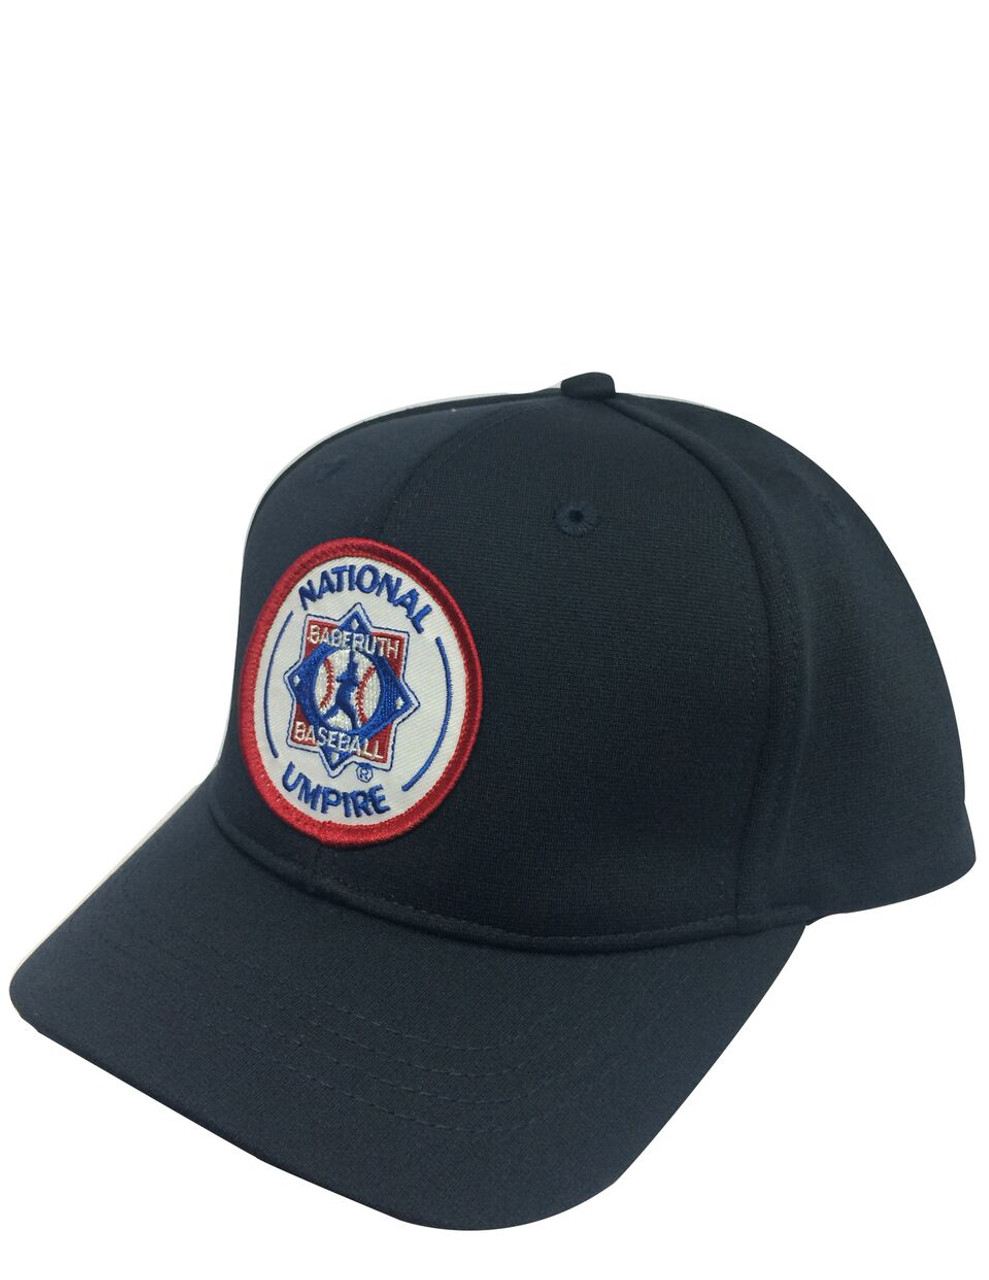 Babe Ruth Baseball Umpire Caps